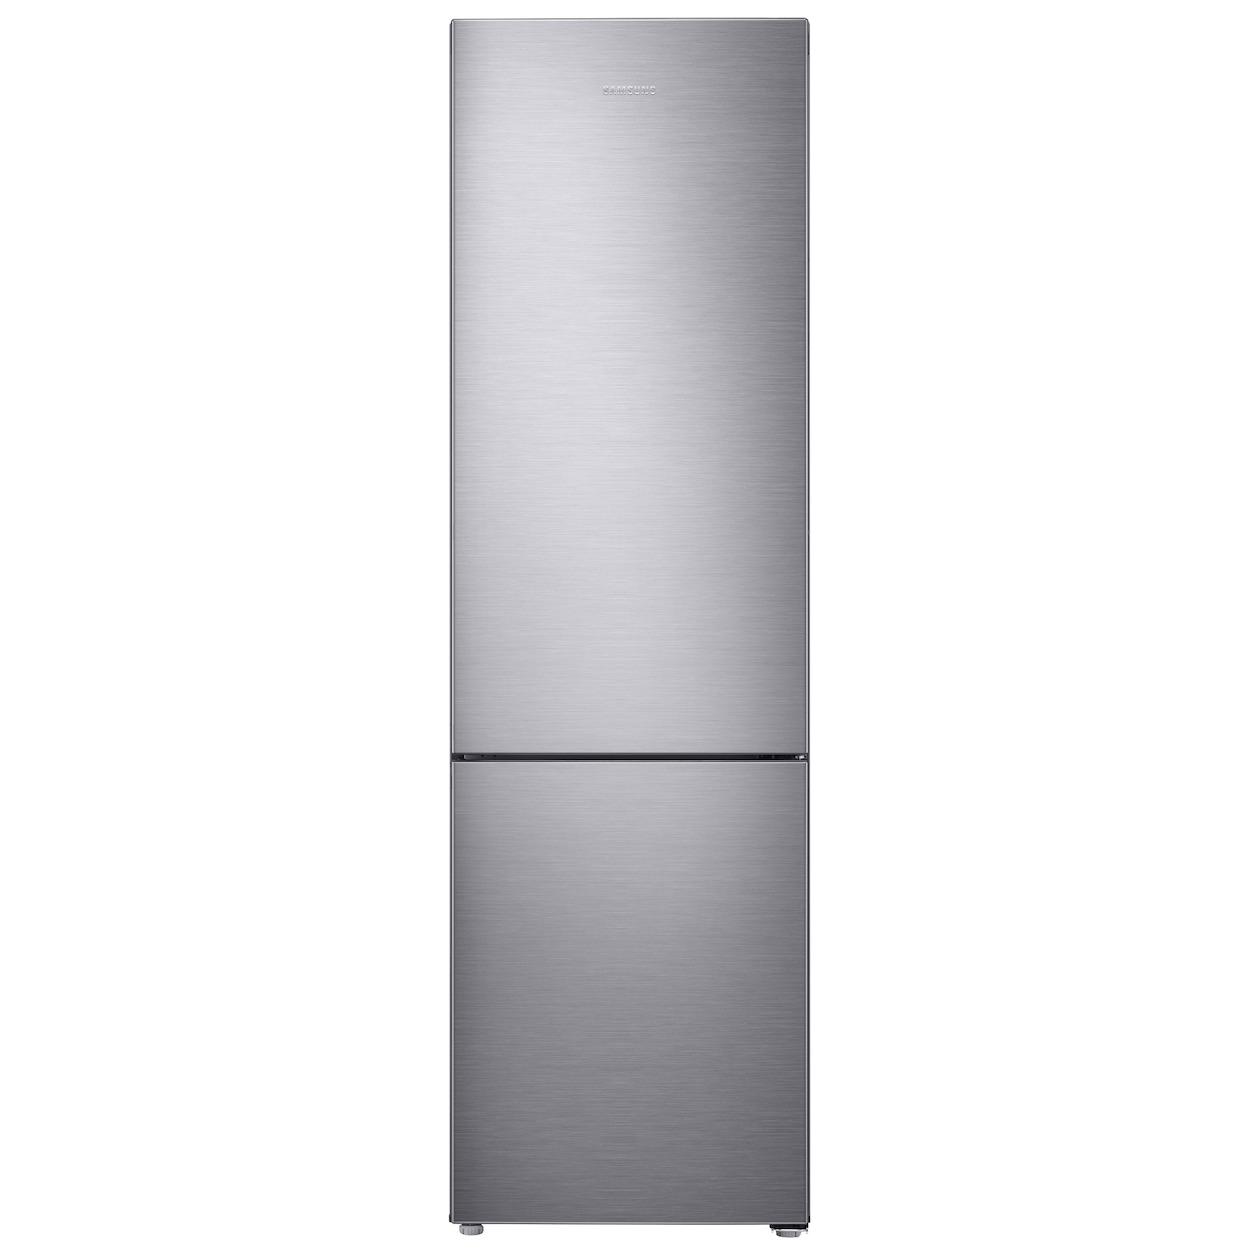 Samsung koelkast met vriesvak RB37J5015SS - Prijsvergelijk